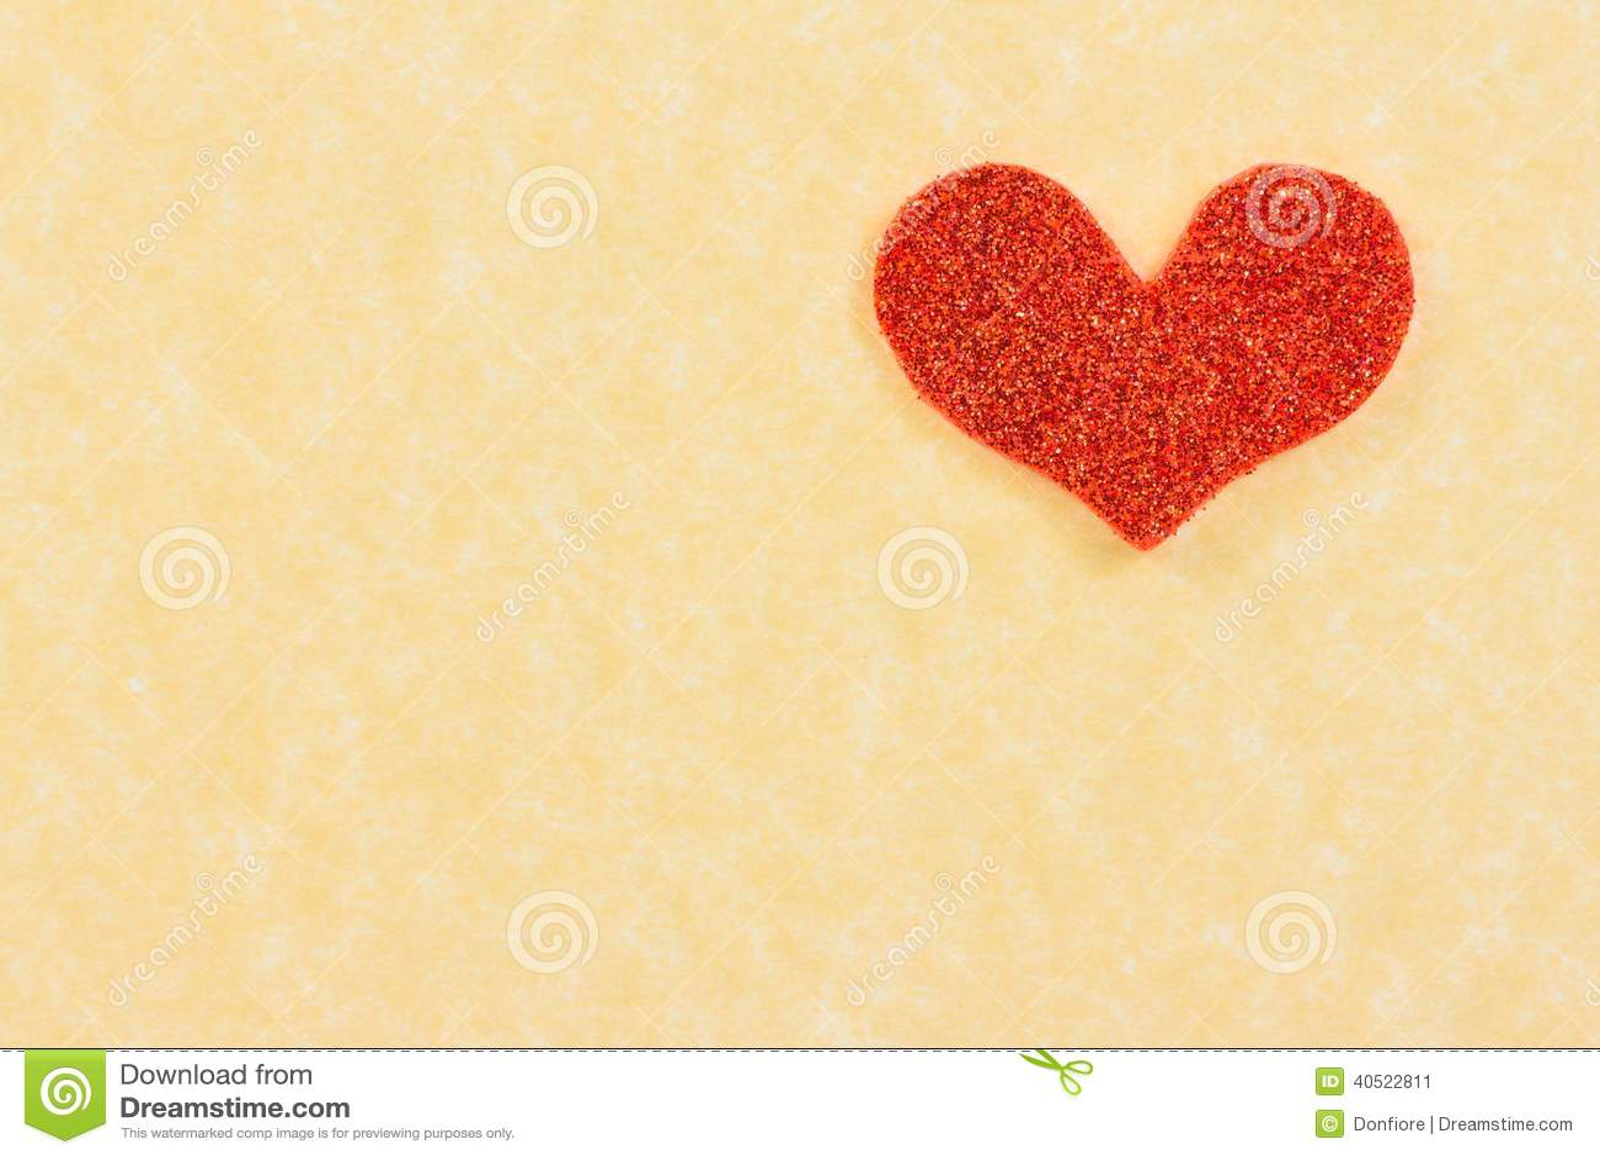 Vintage Heart Background Red heart on vintage parchment